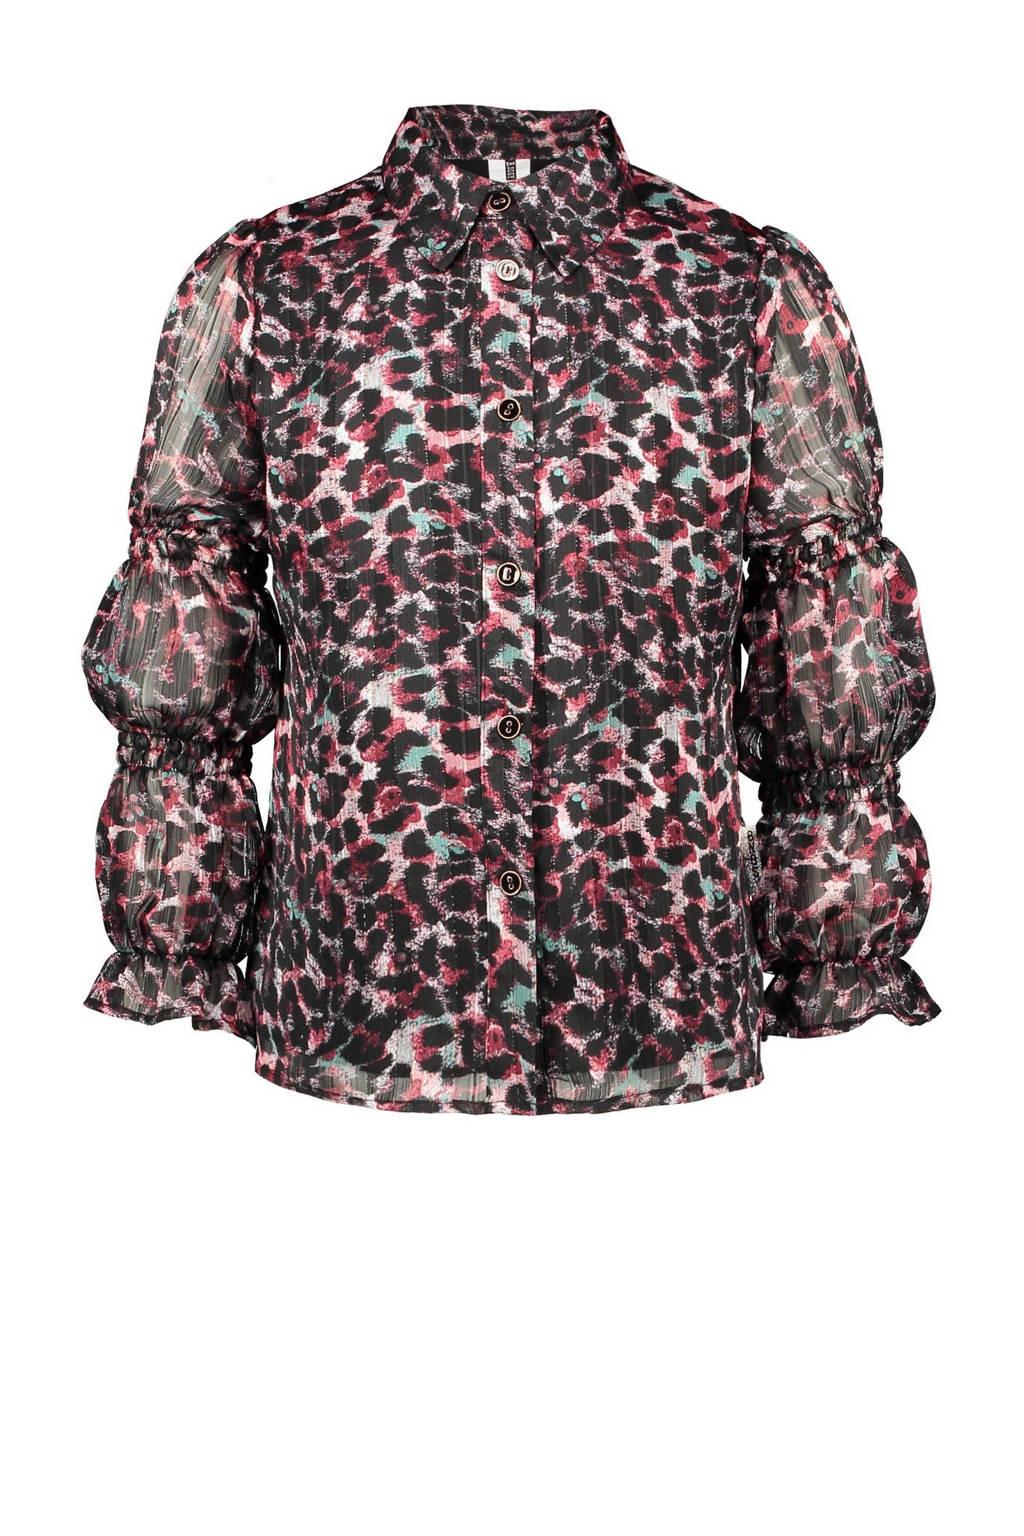 B.Nosy blouse met all over print roze/zwart, Roze/zwart